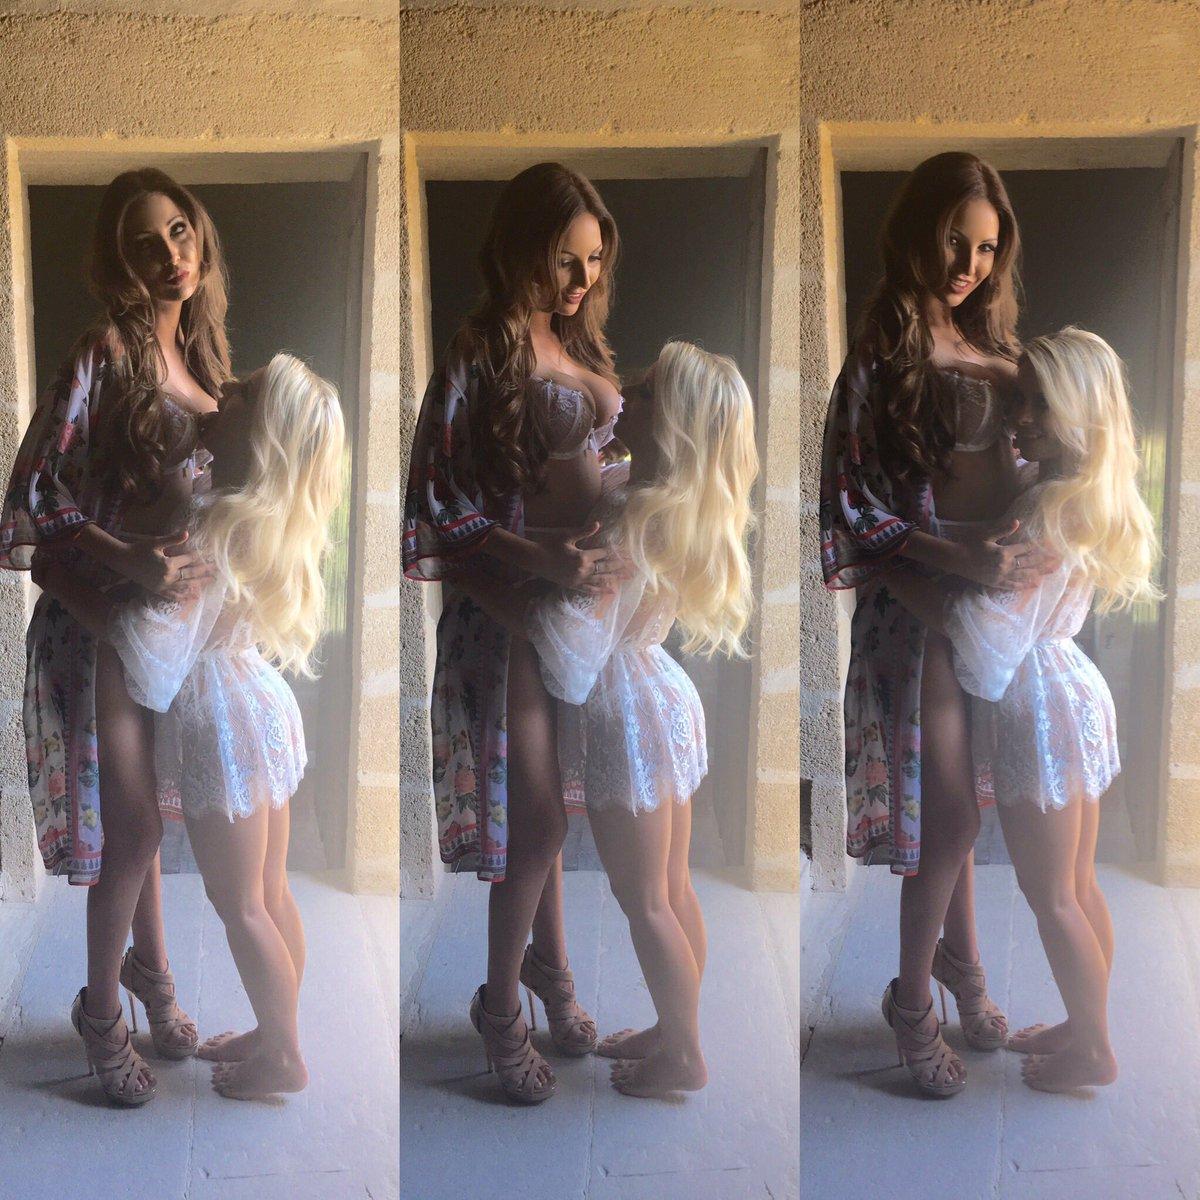 Every petite blonde needs a tall brunette 💜 BFkozNkvex